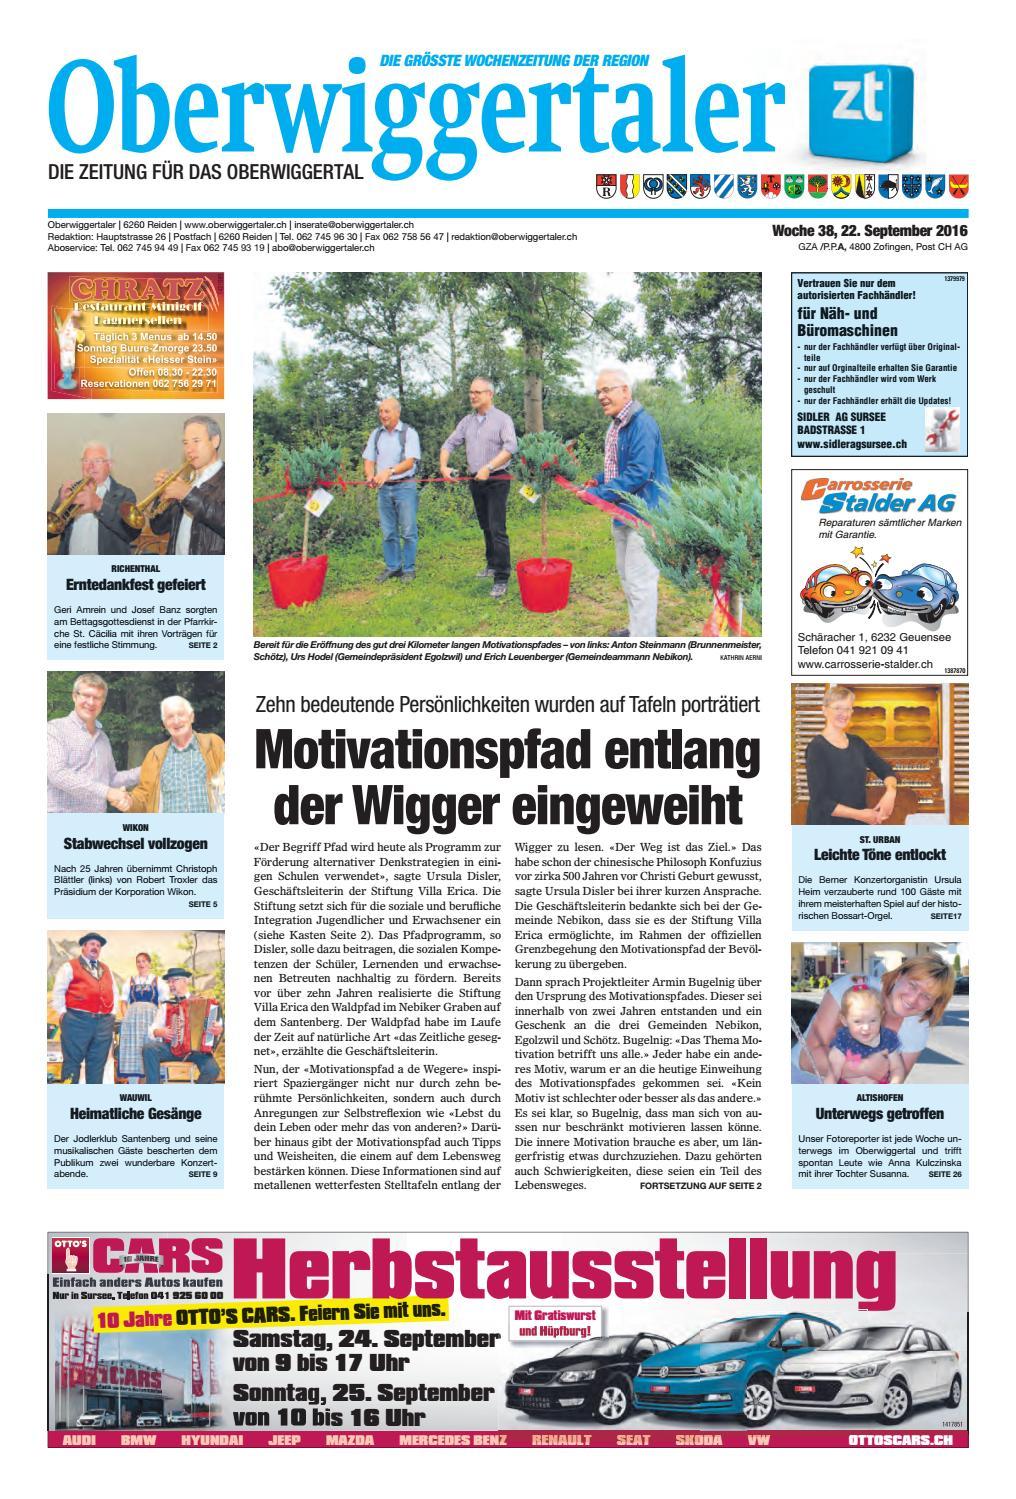 Single Mnner Bezirk In Grindelwald Partnersuche Ab 60 Le